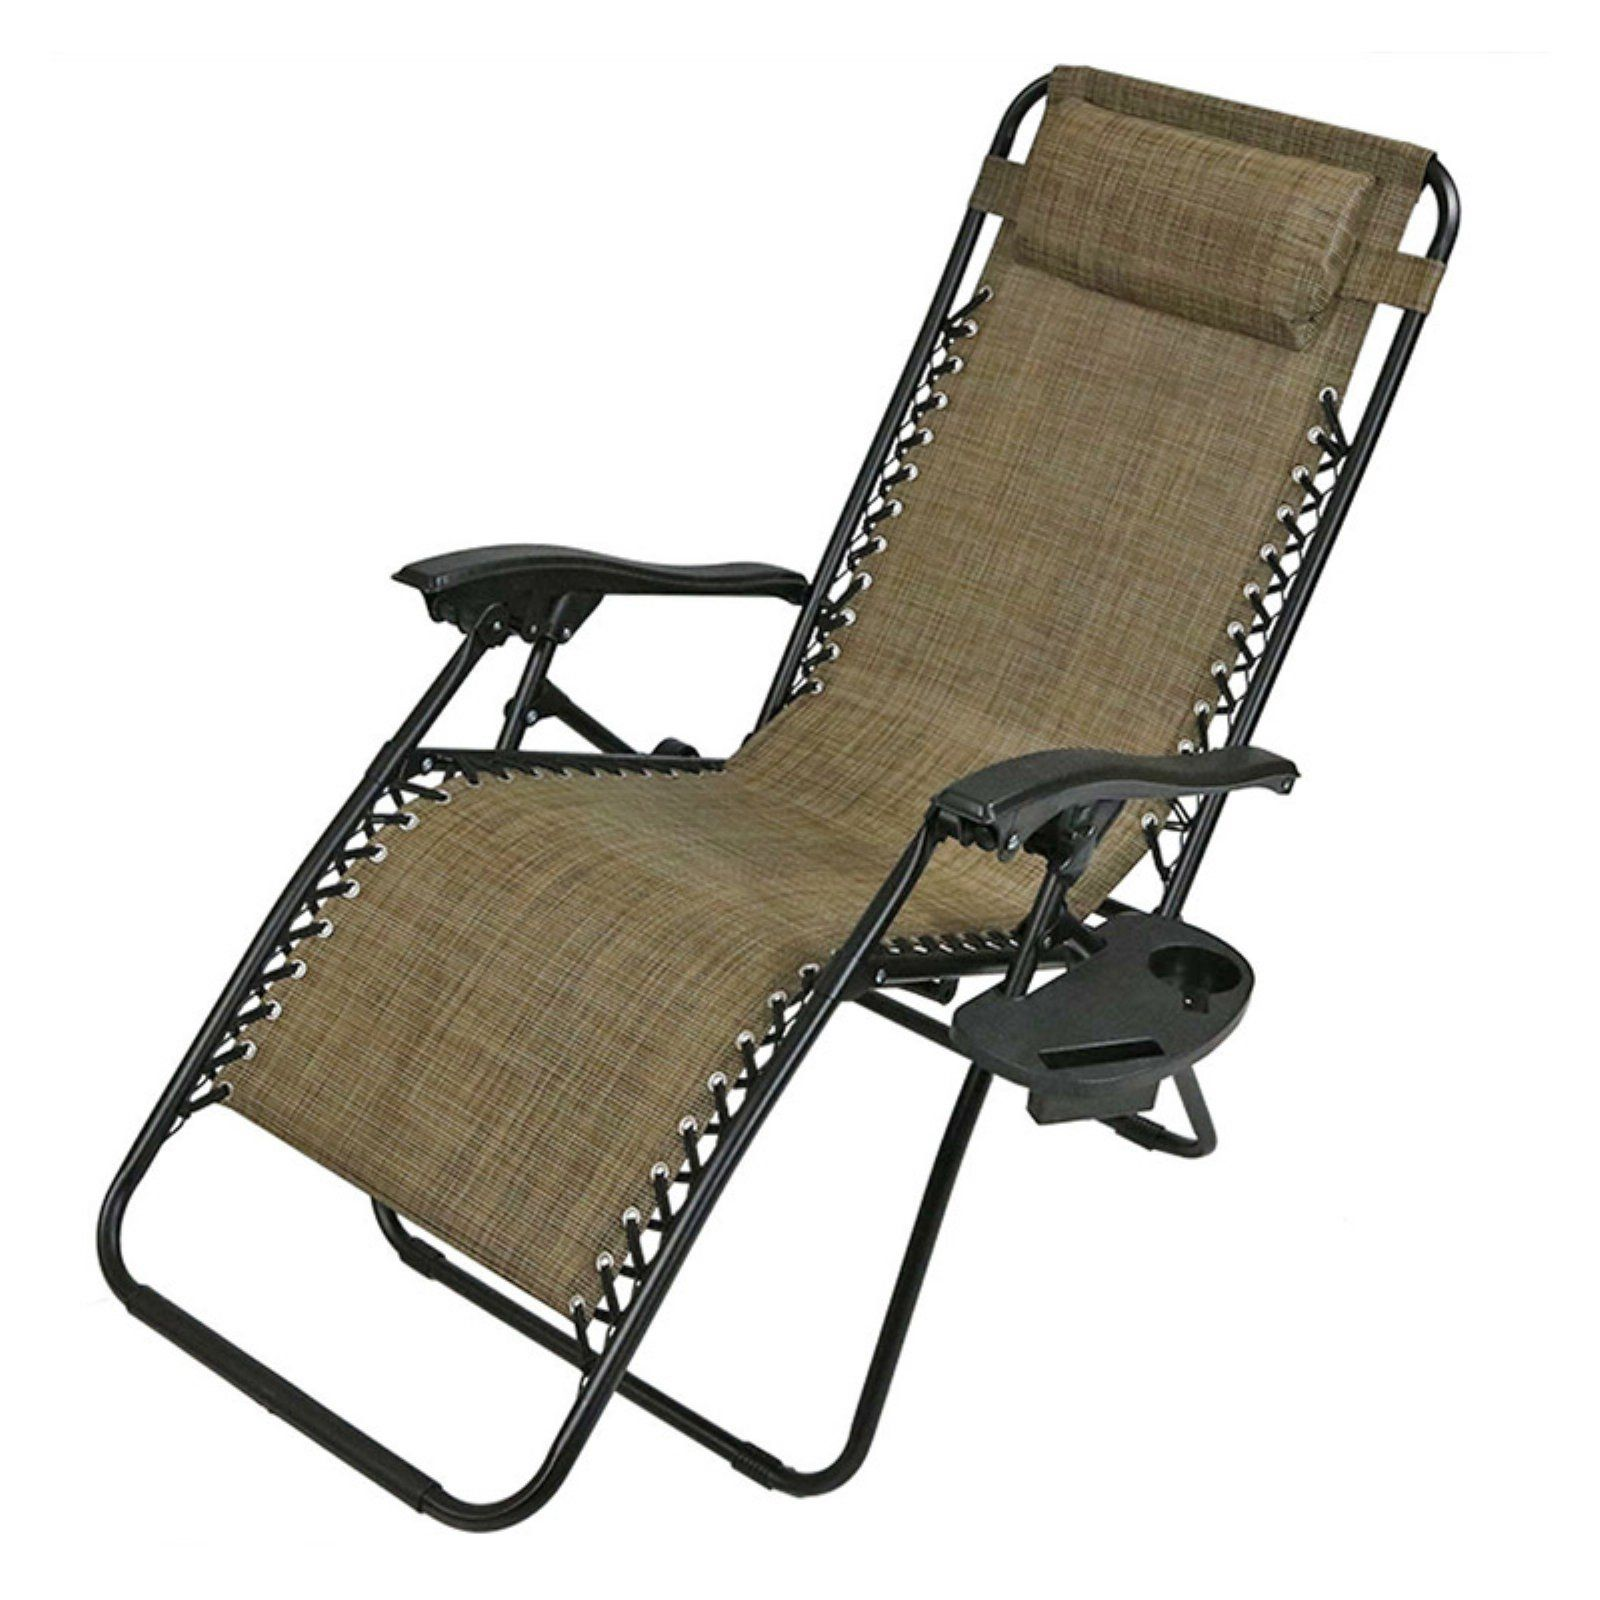 Miraculous Outdoor Sunnydaze Decor Zero Gravity Lounge Chair In 2019 Onthecornerstone Fun Painted Chair Ideas Images Onthecornerstoneorg